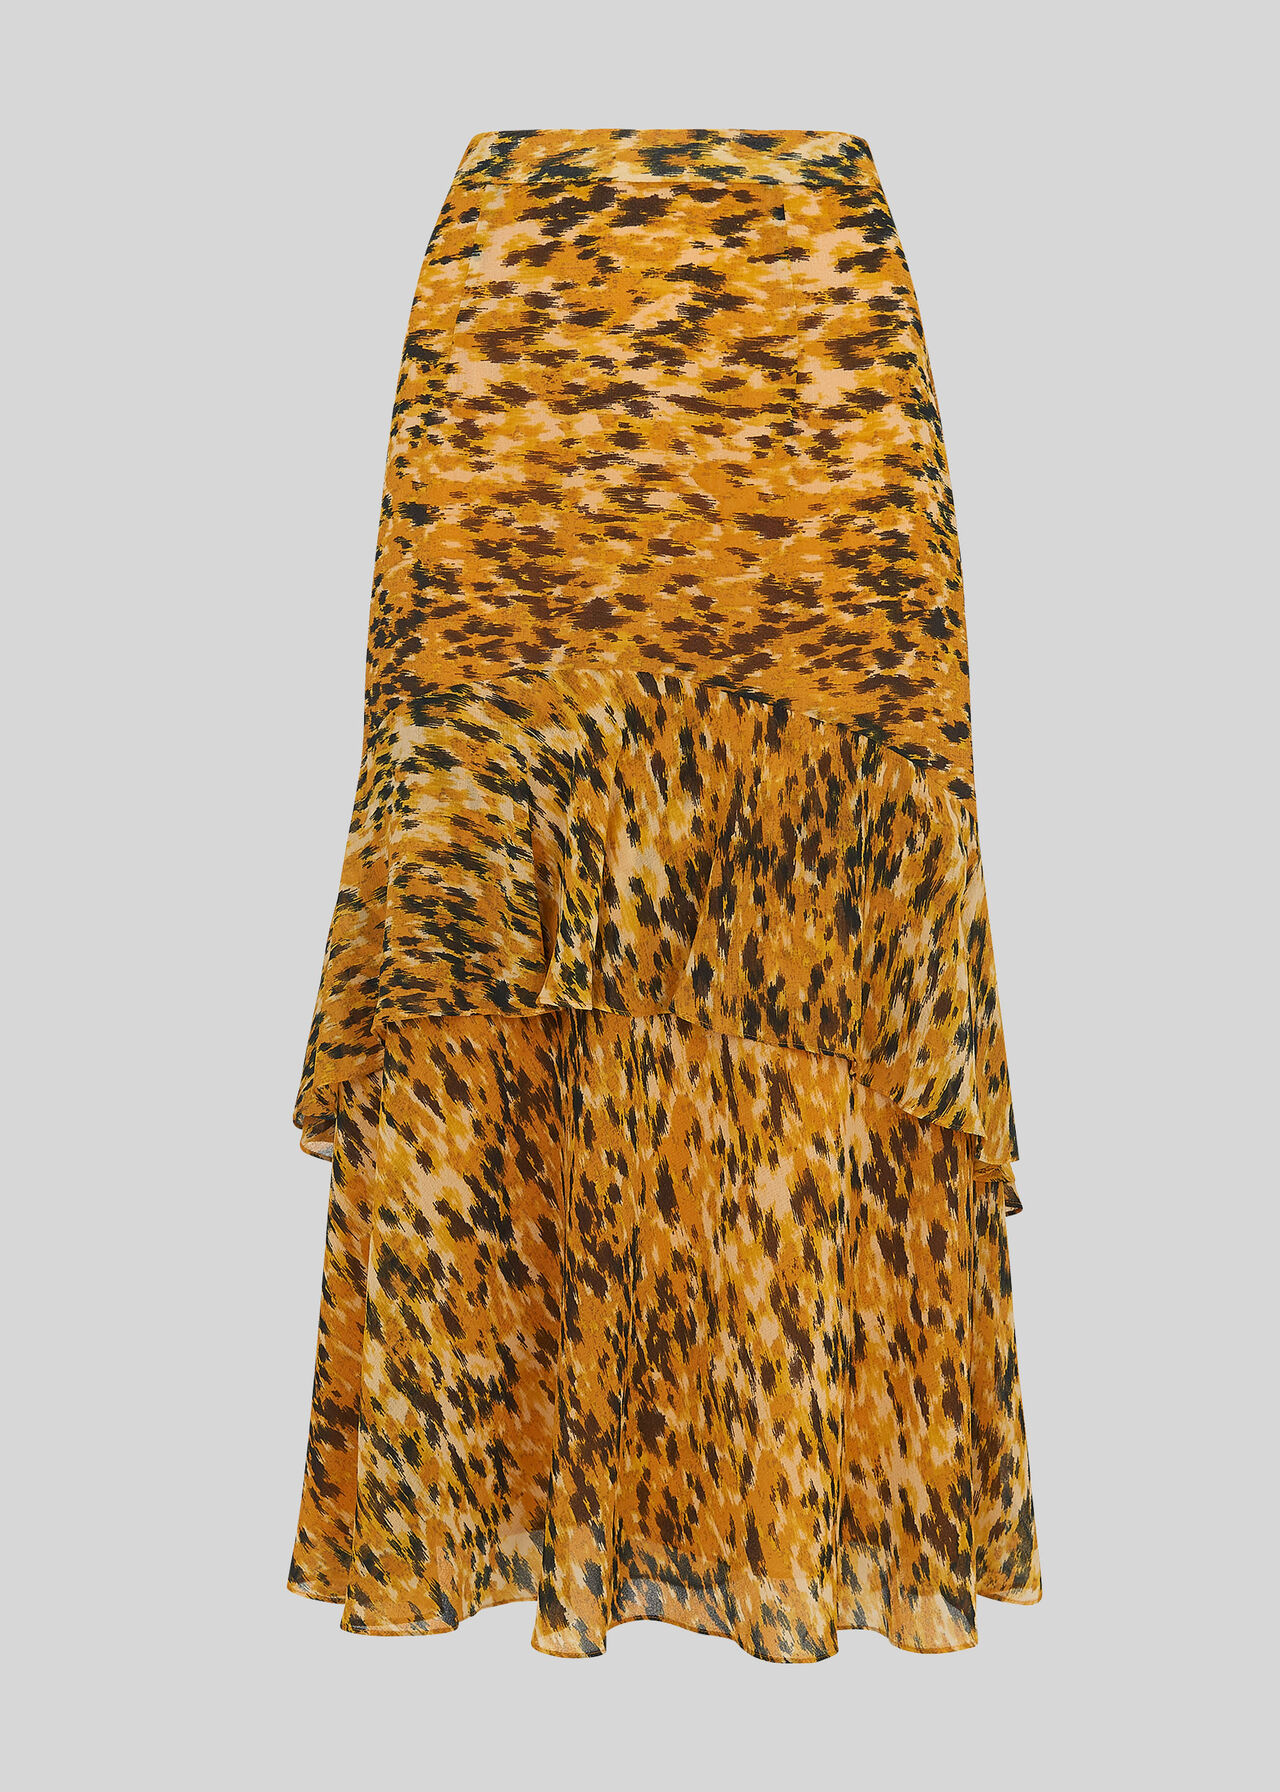 Whistles Femmes Jaune//Multicolore Midi Longueur Ikat Animal Midi Jupe RRP139 UK6 nouveau